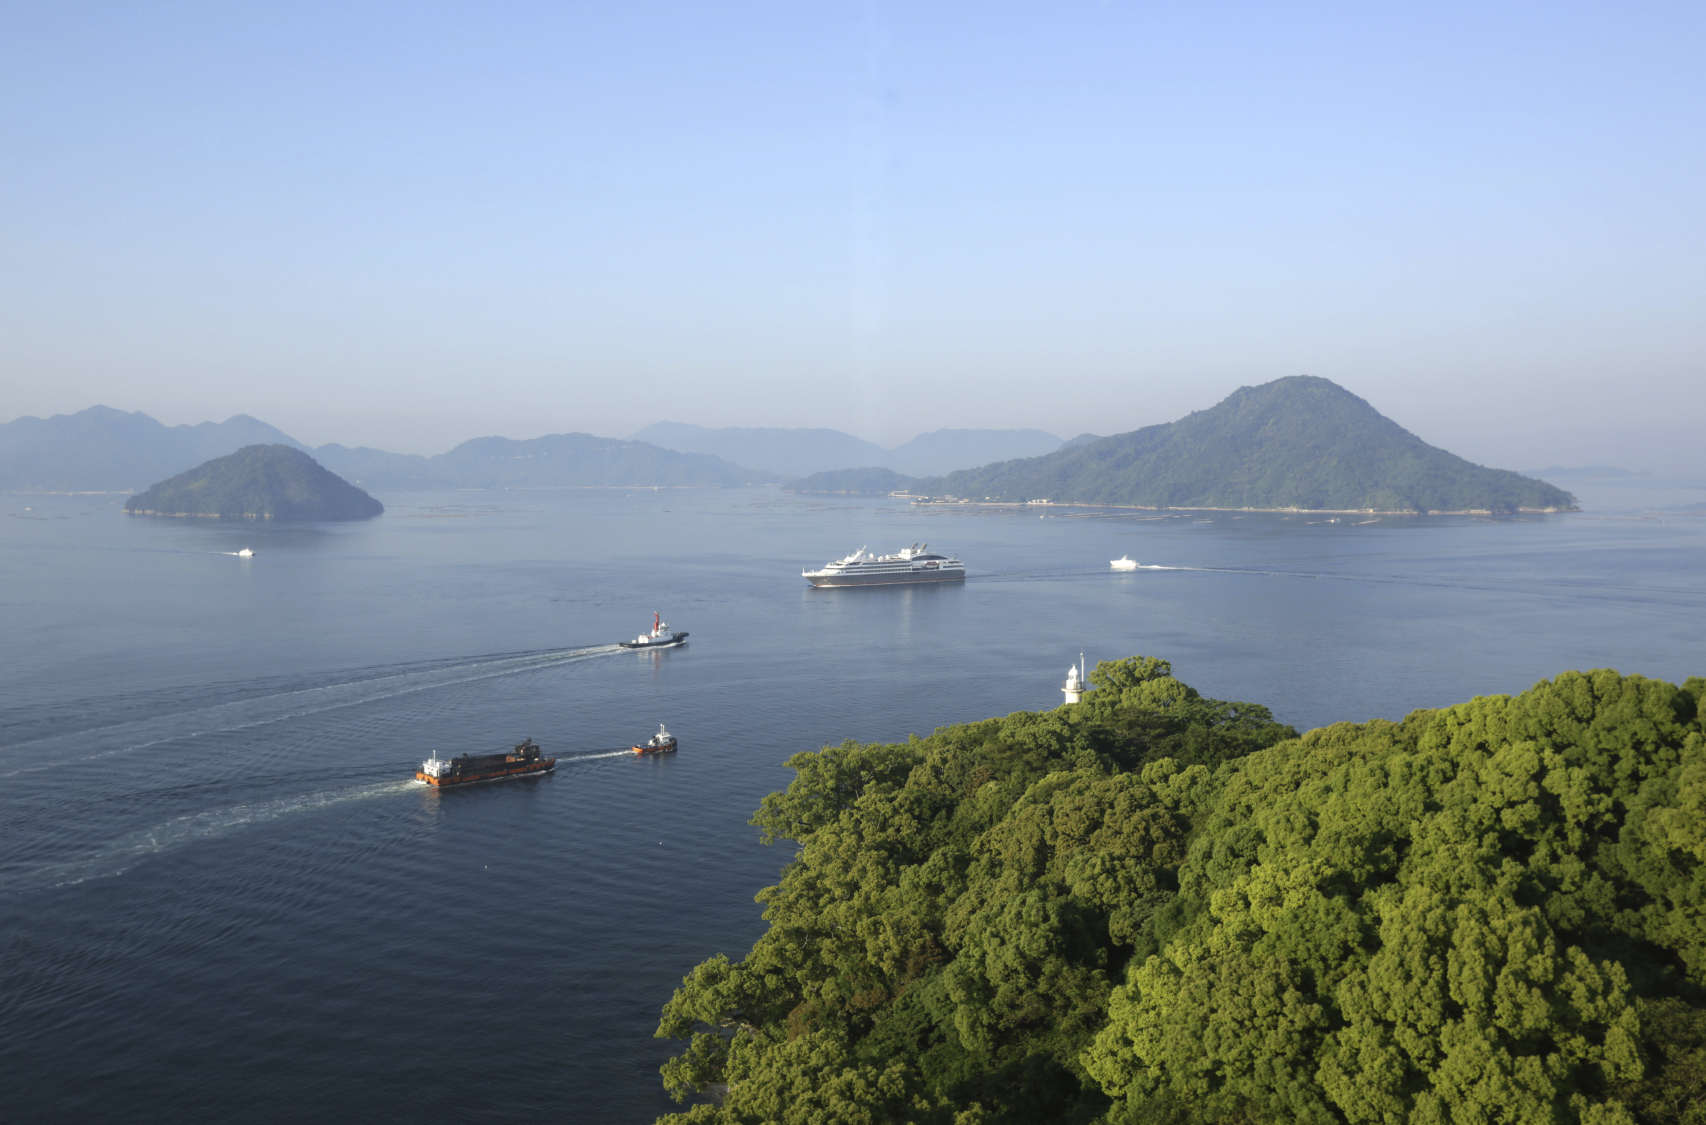 Hiroshima Bay, Seto Inland Sea, Japan